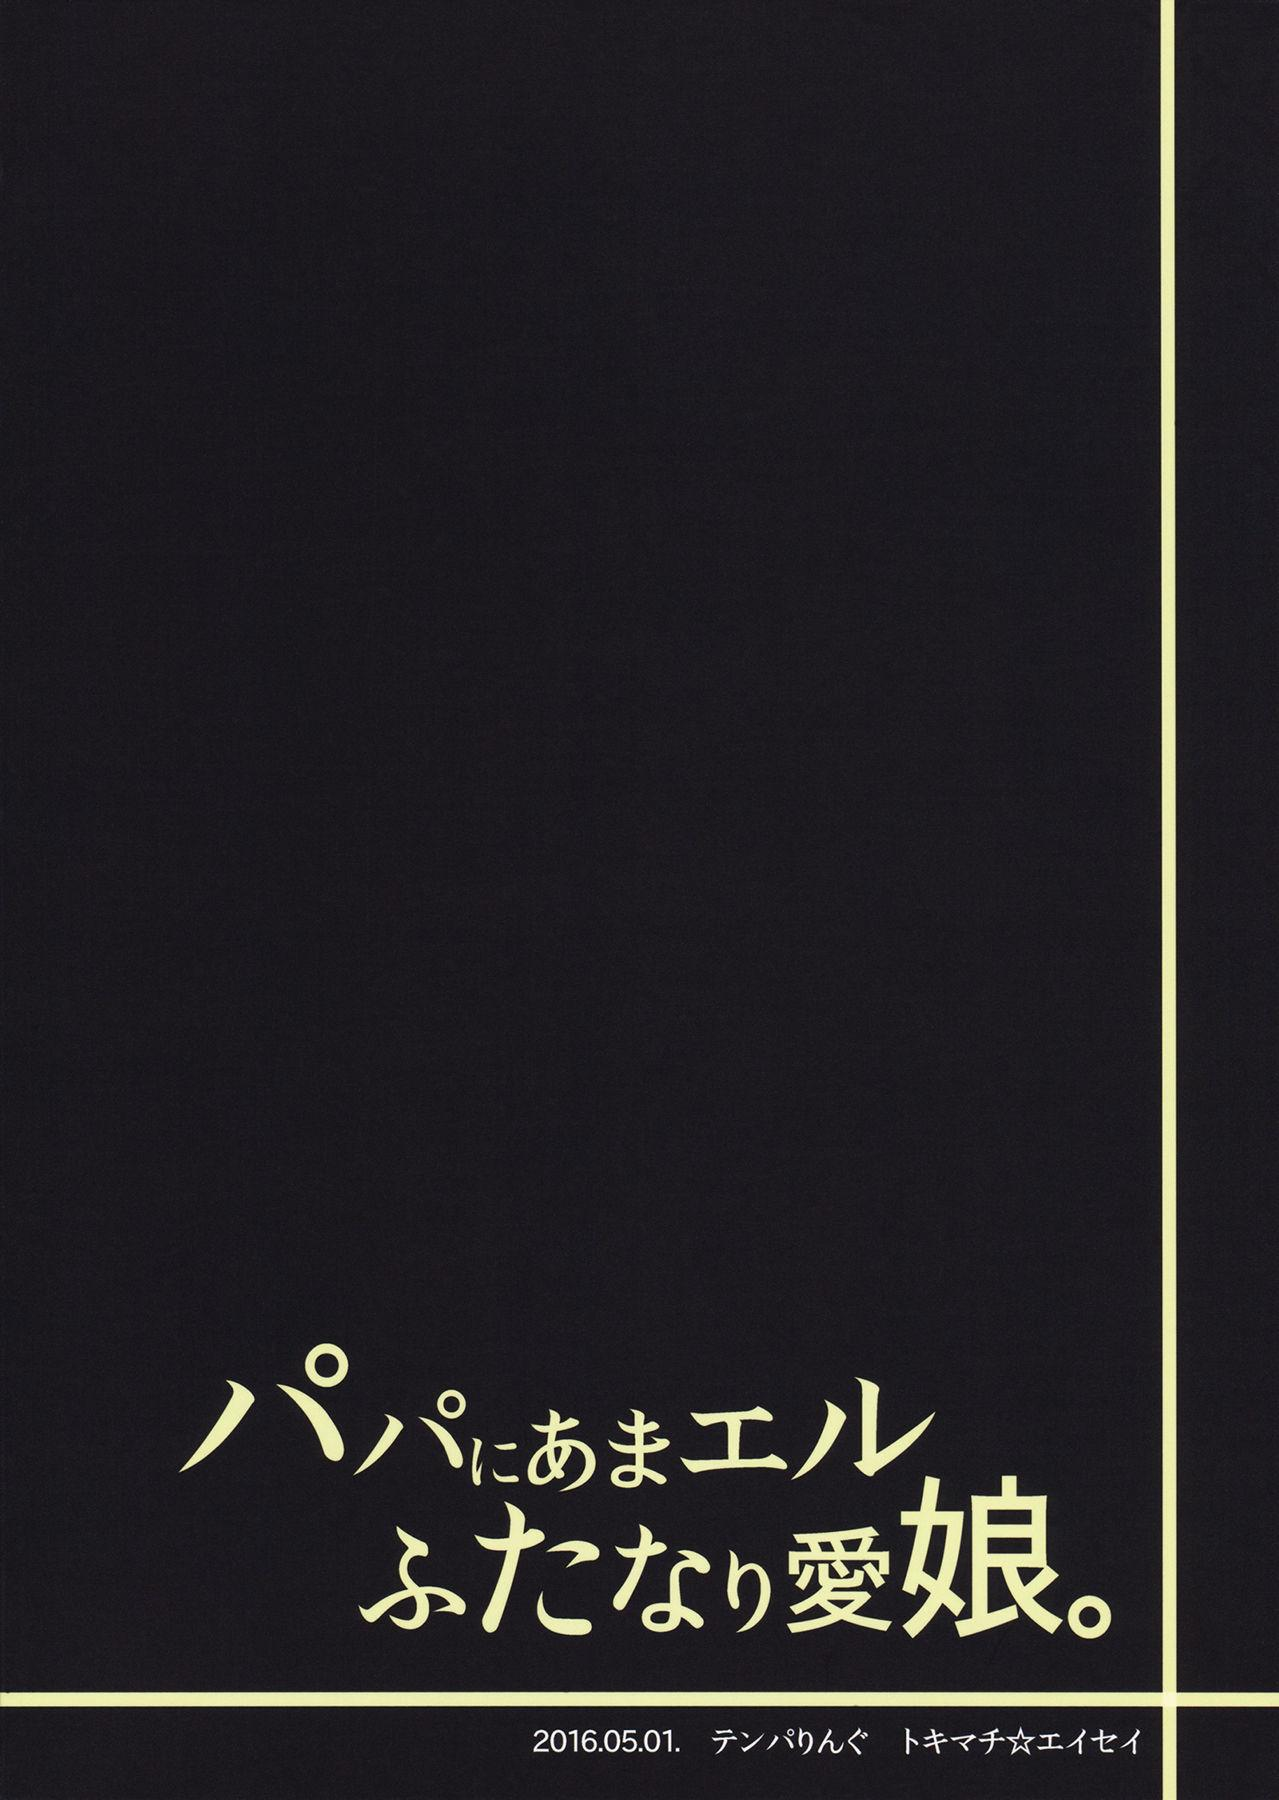 (COMIC1☆10) [Temparing (Tokimachi Eisei)] Papa ni AmaElle Futanari Manamusume | Daddy's Spoiled, BELLEoved Little (Futanari) Girl (Tales of Xillia 2) [English] [Zero Translations] 29